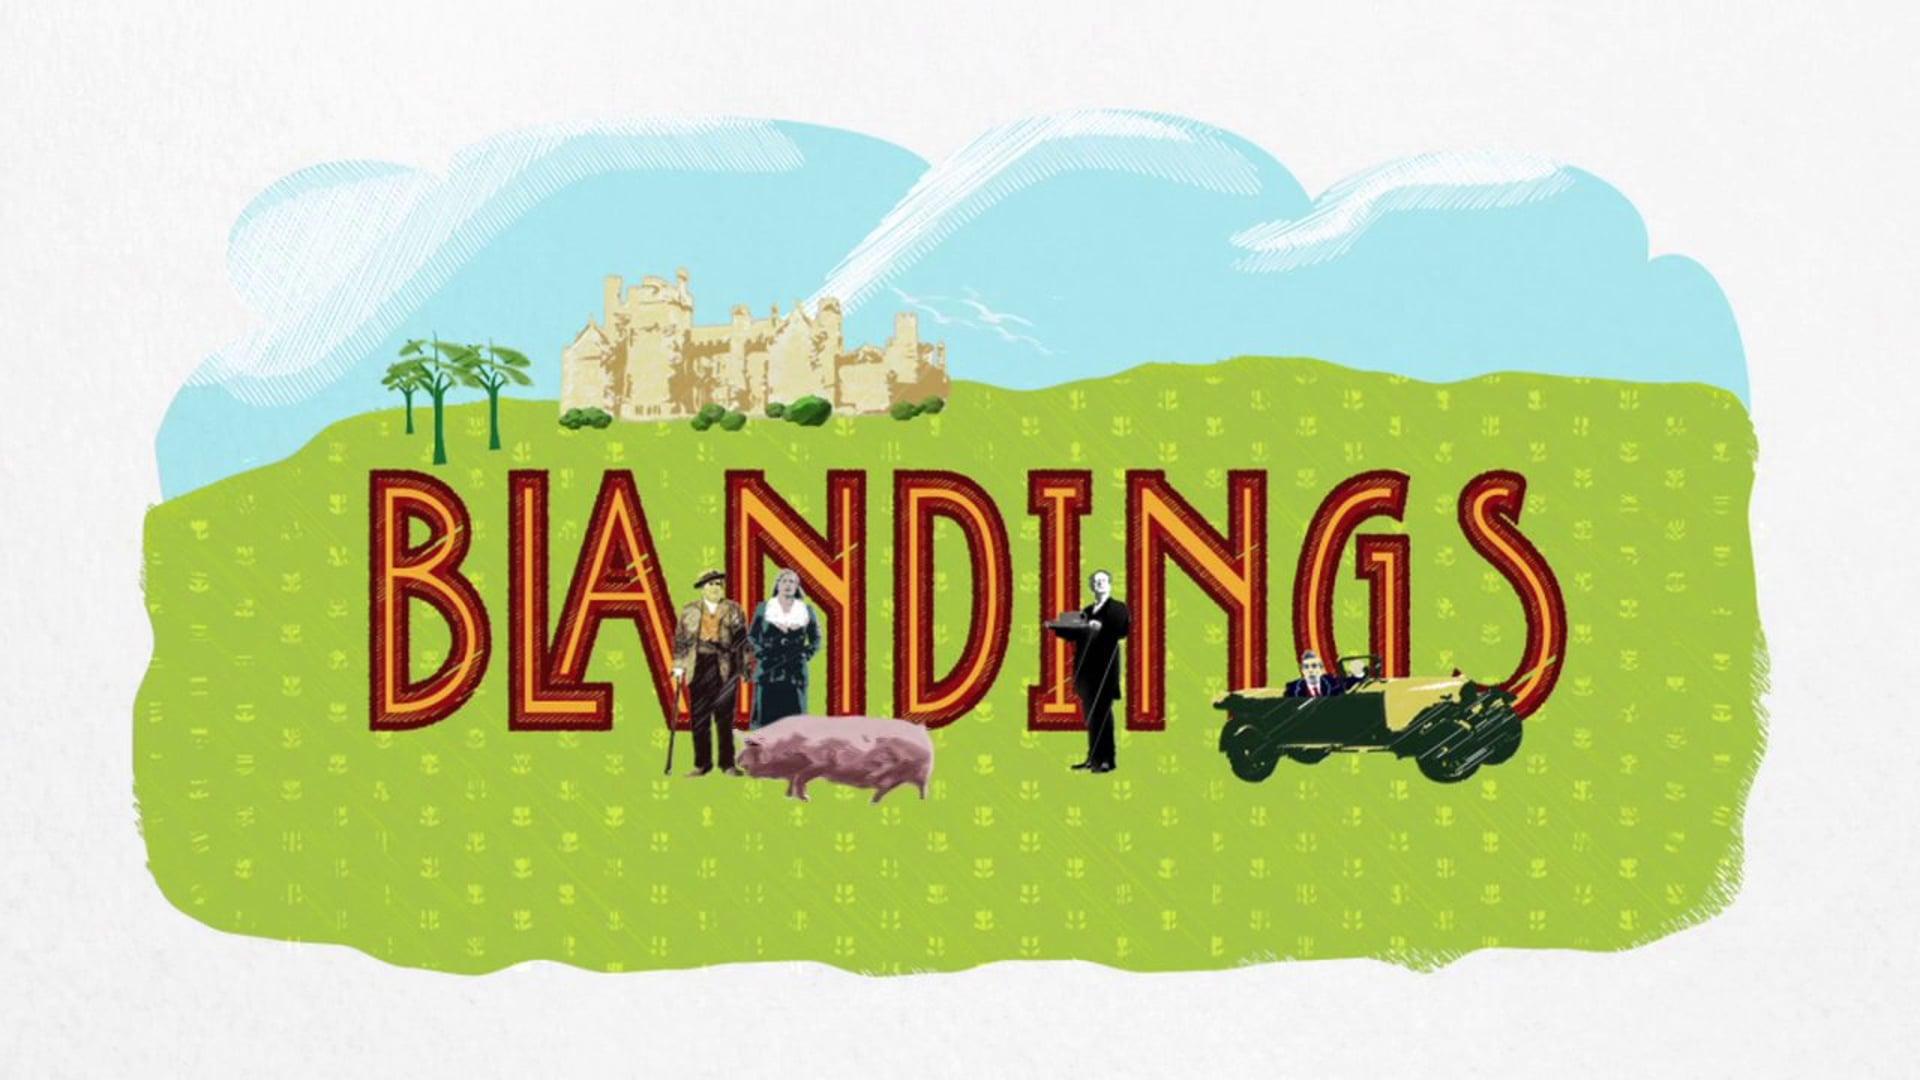 BBC Blandings